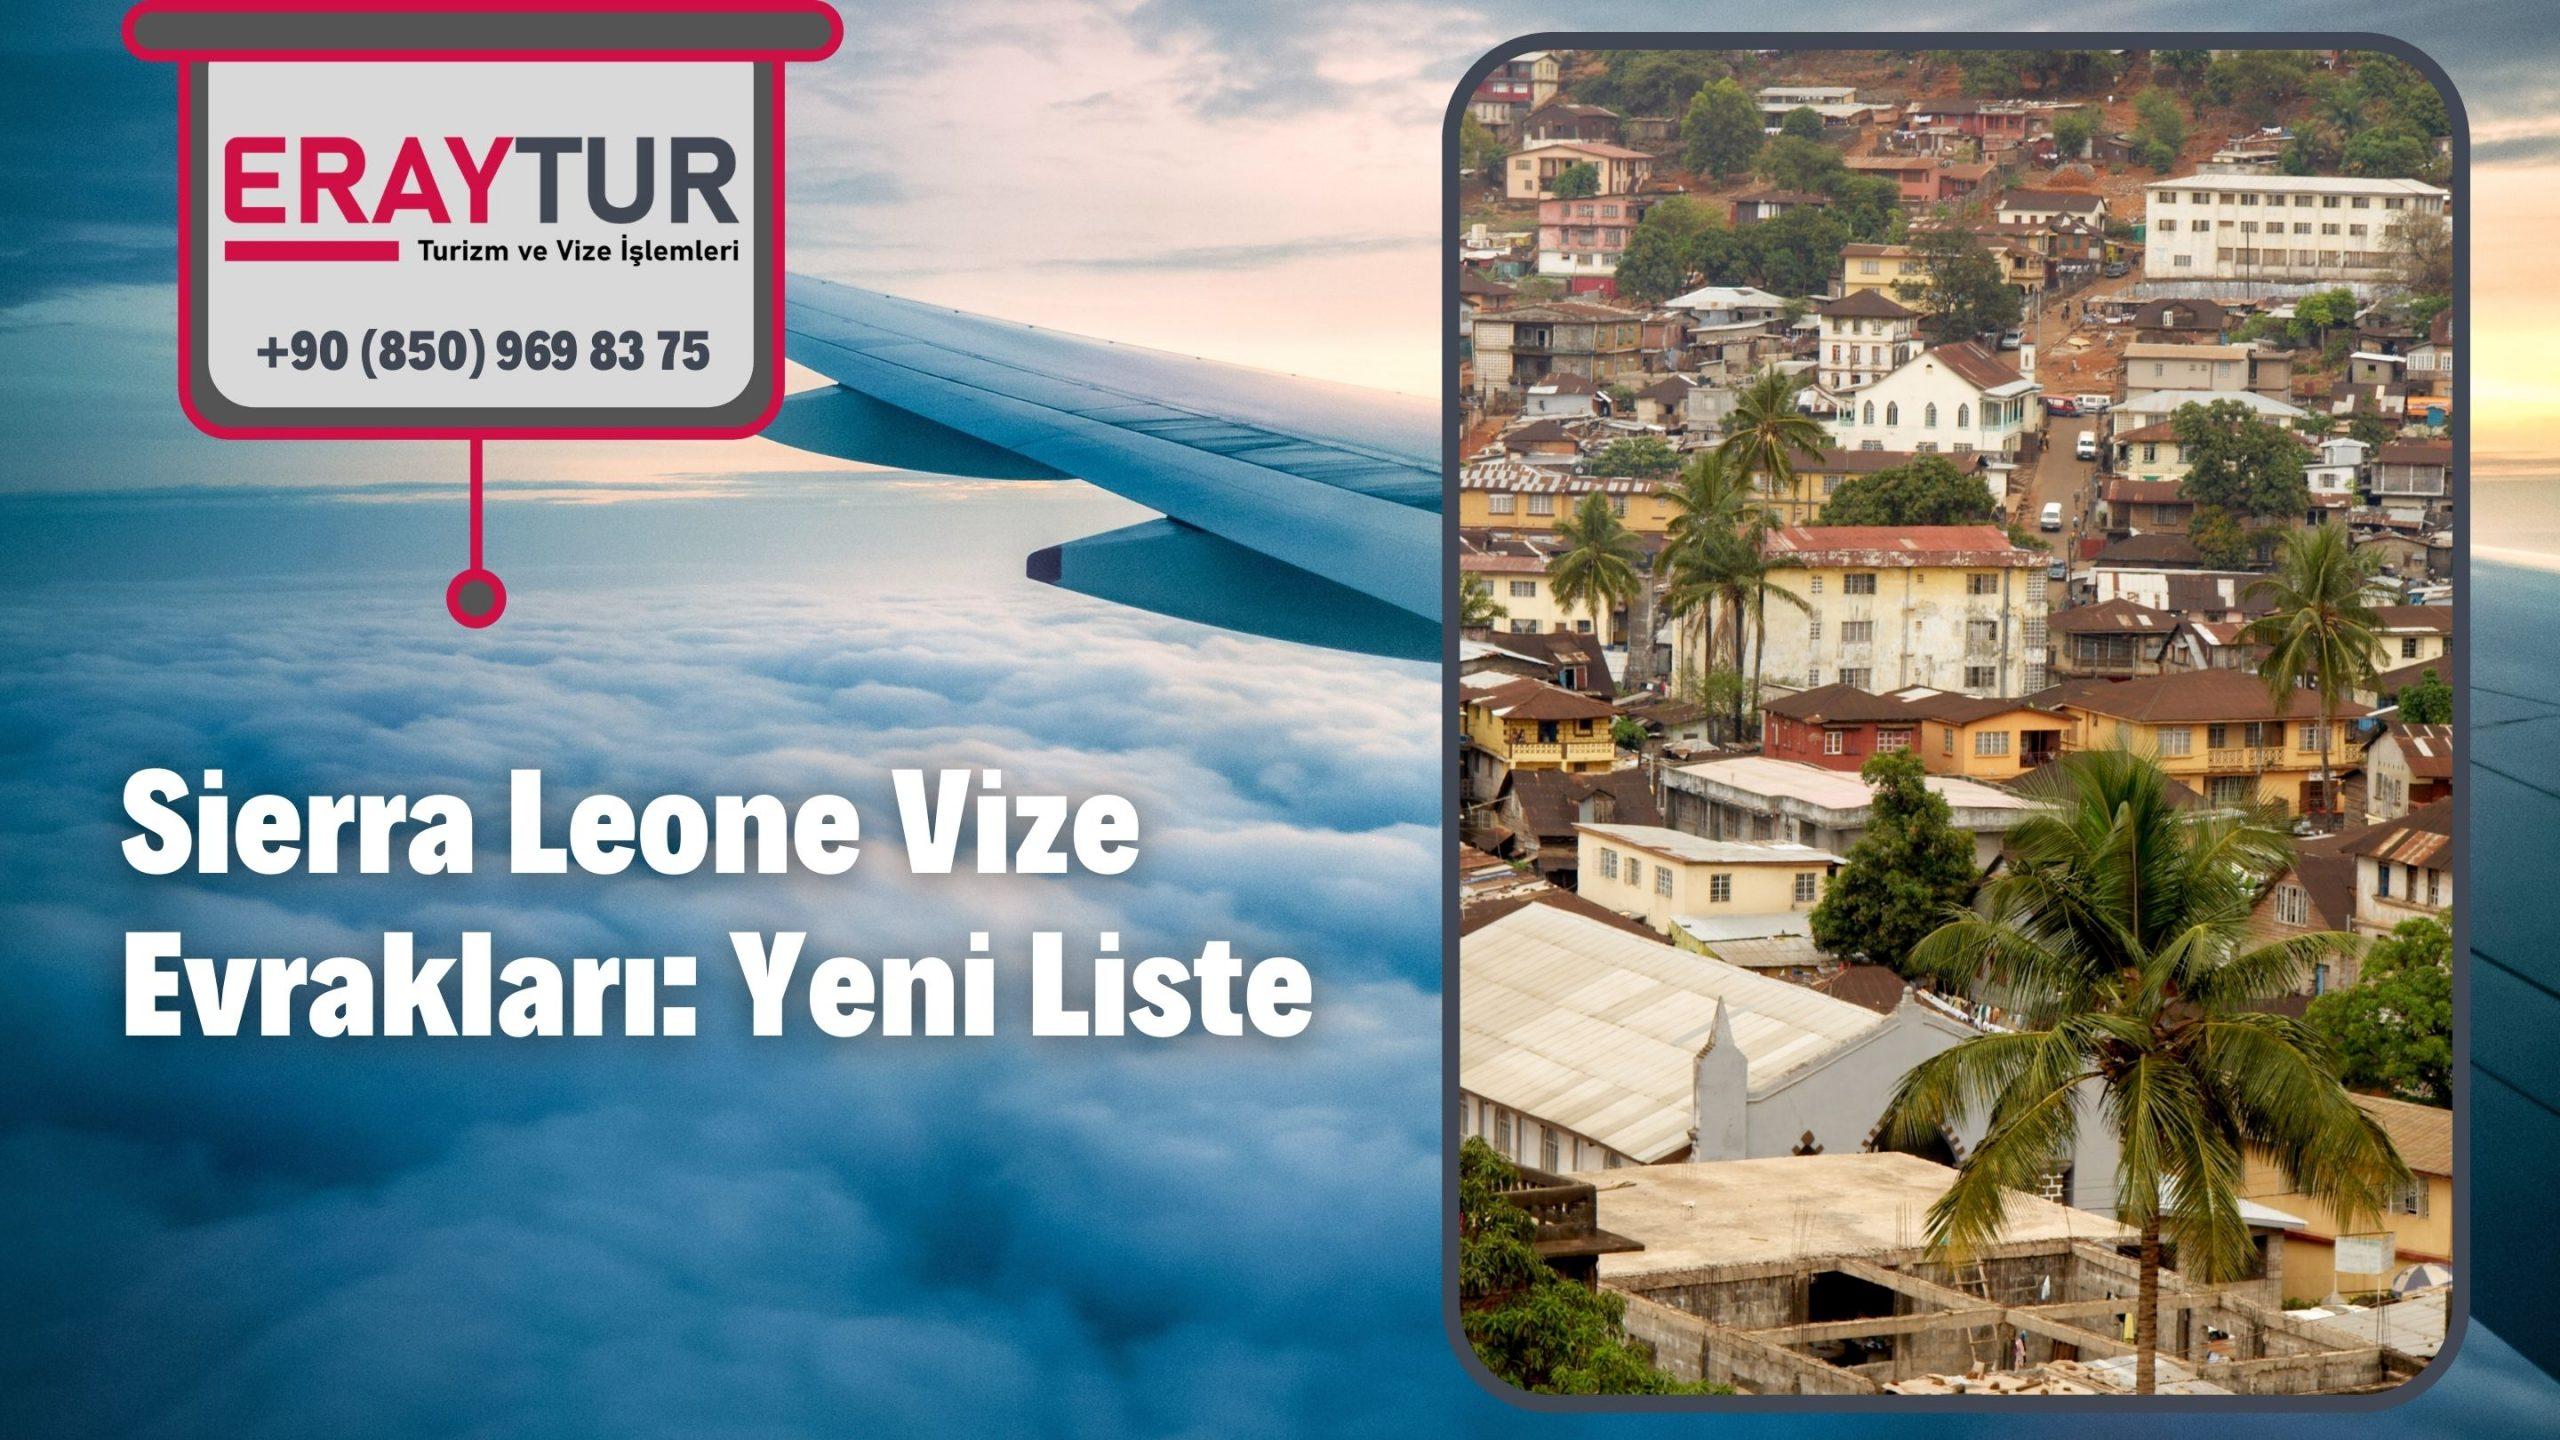 Sierra Leone Vize Evrakları: Yeni Liste [2021] 1 – sierra leone vize evraklari yeni liste 2021 1 scaled